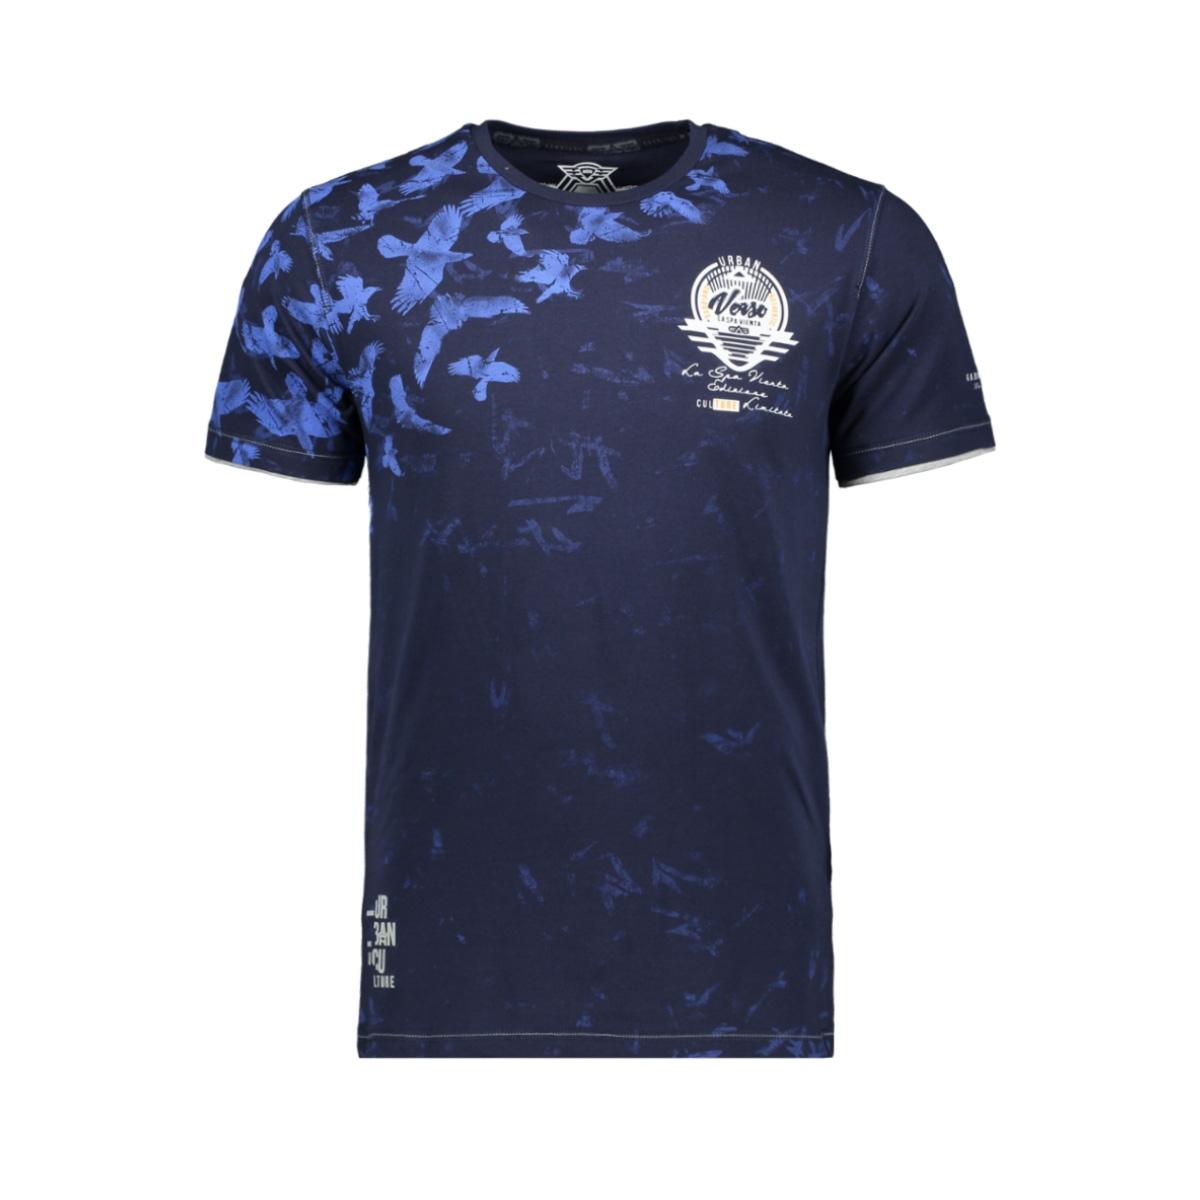 t shirt 13888 gabbiano t-shirt navy